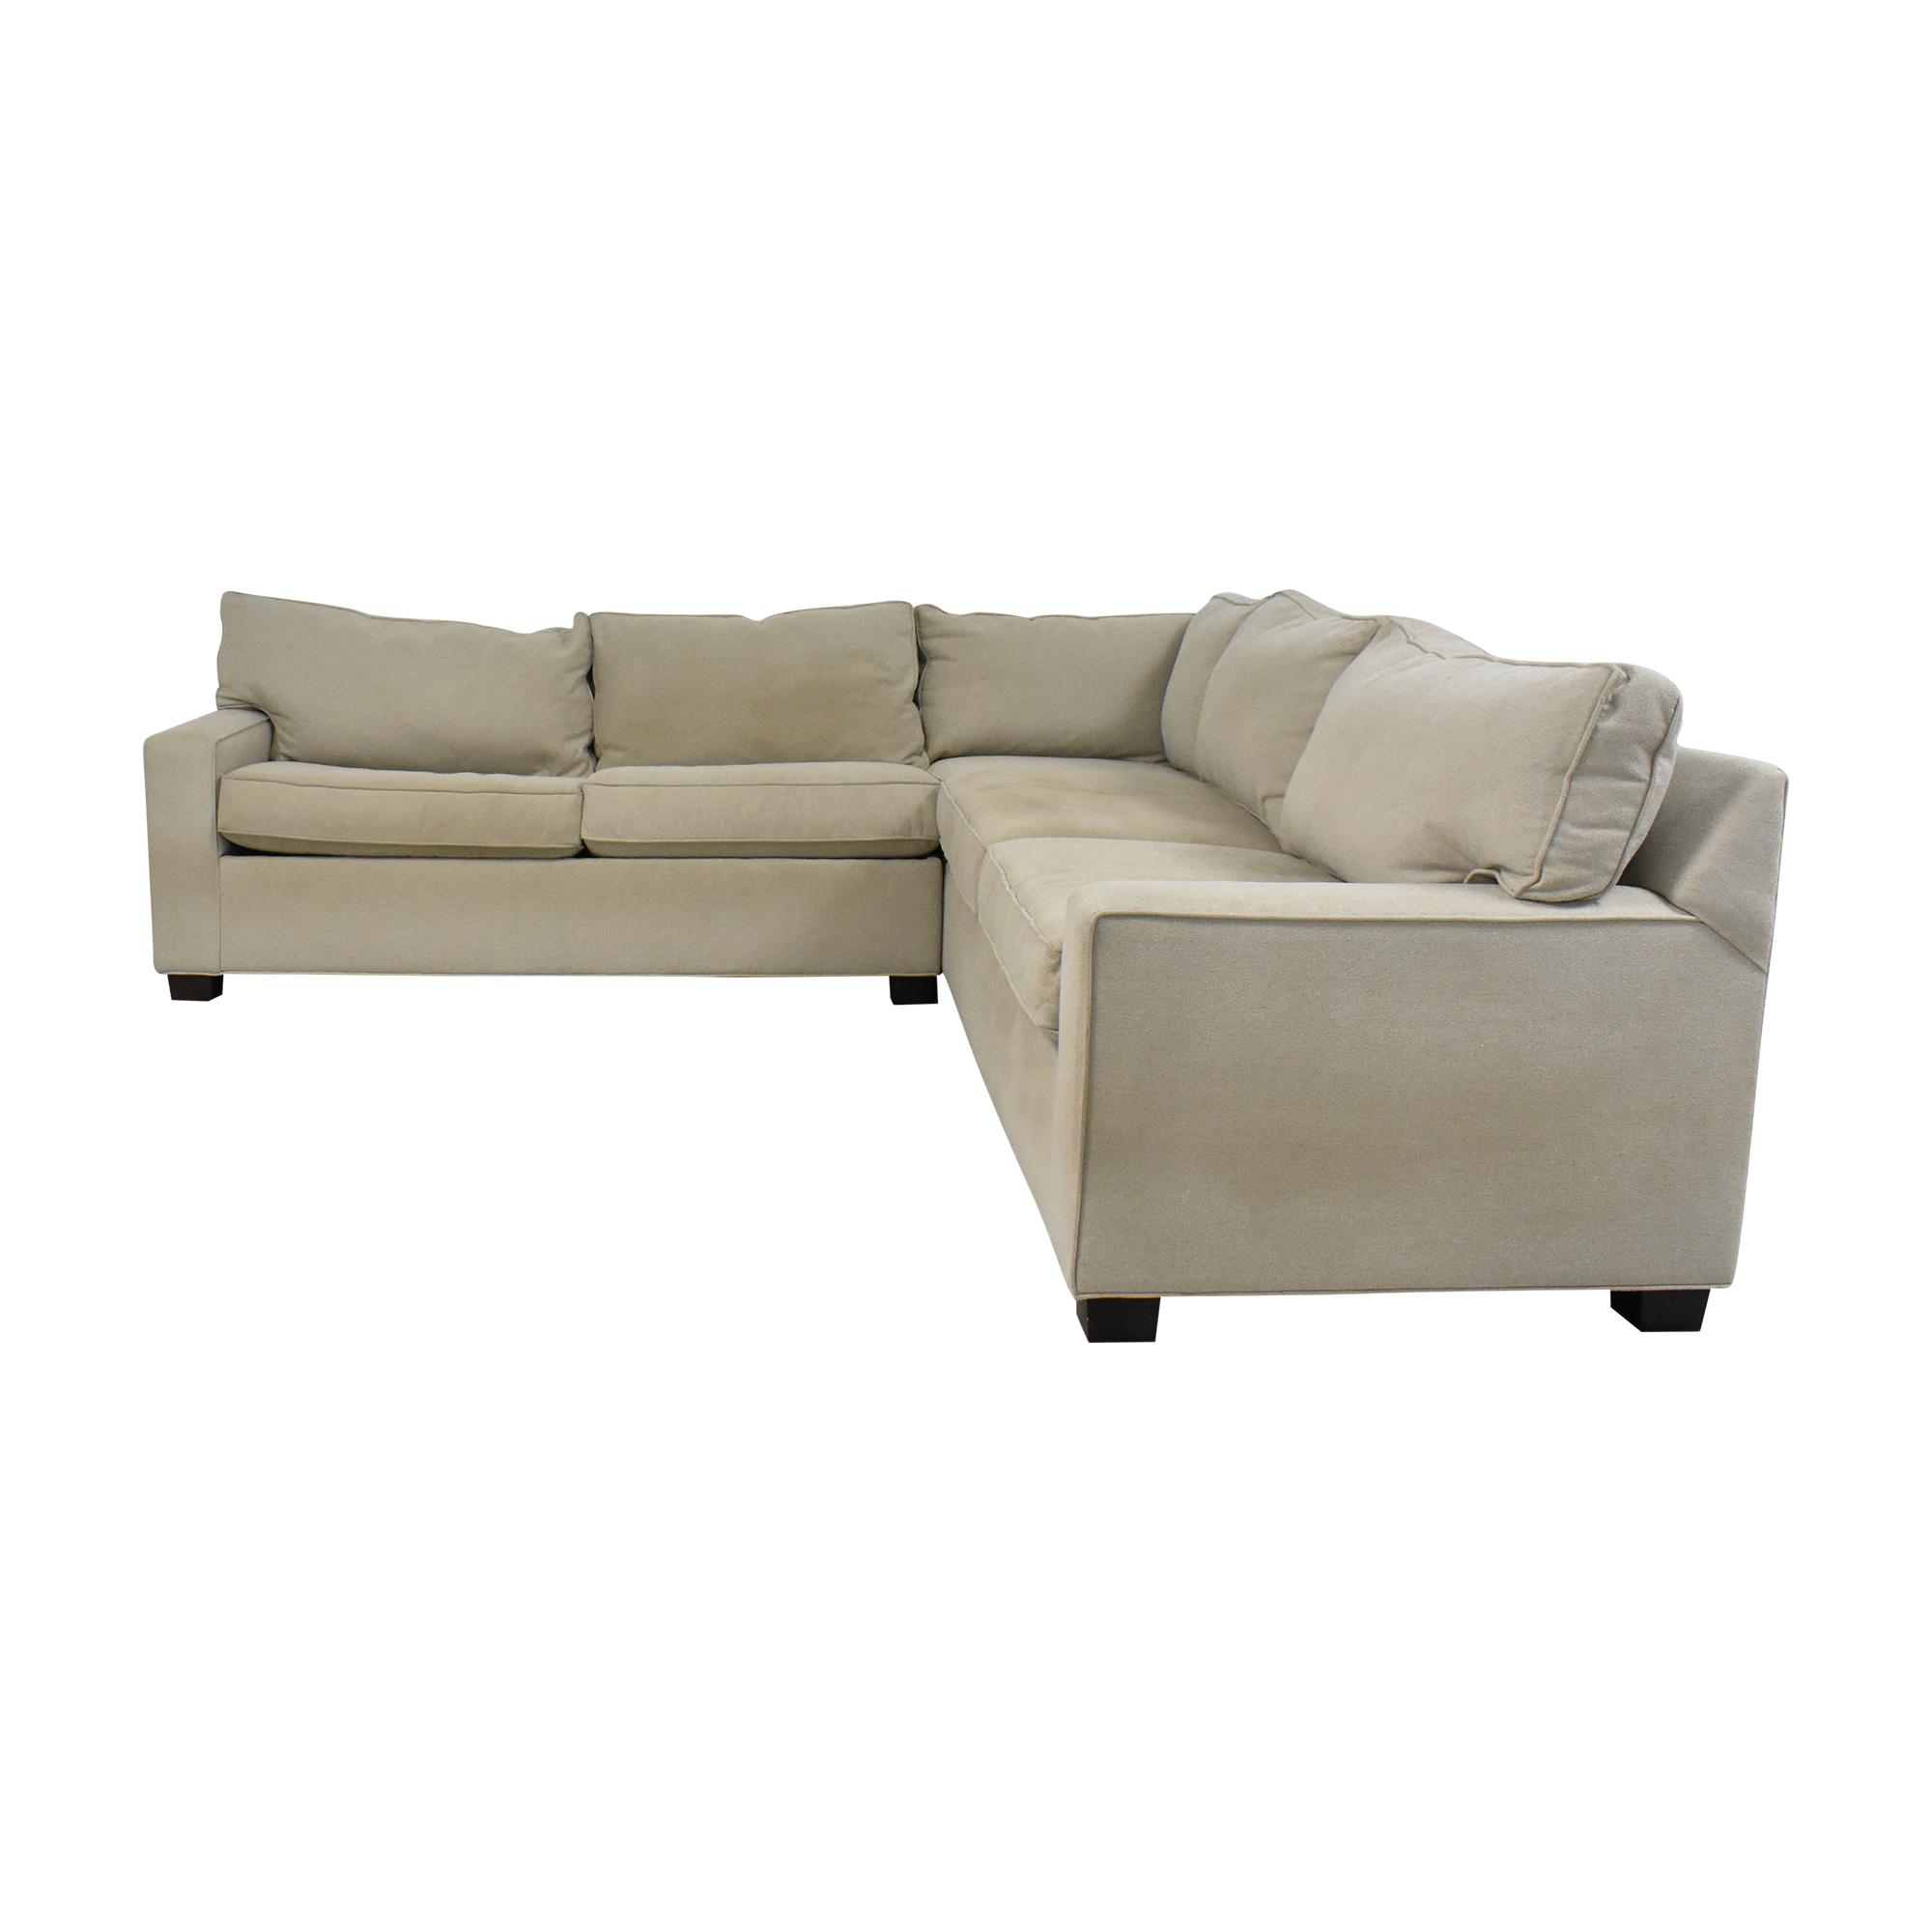 Mitchell Gold + Bob Williams Mitchell Gold + Bob Williams Sectional Sleeper Sofa discount